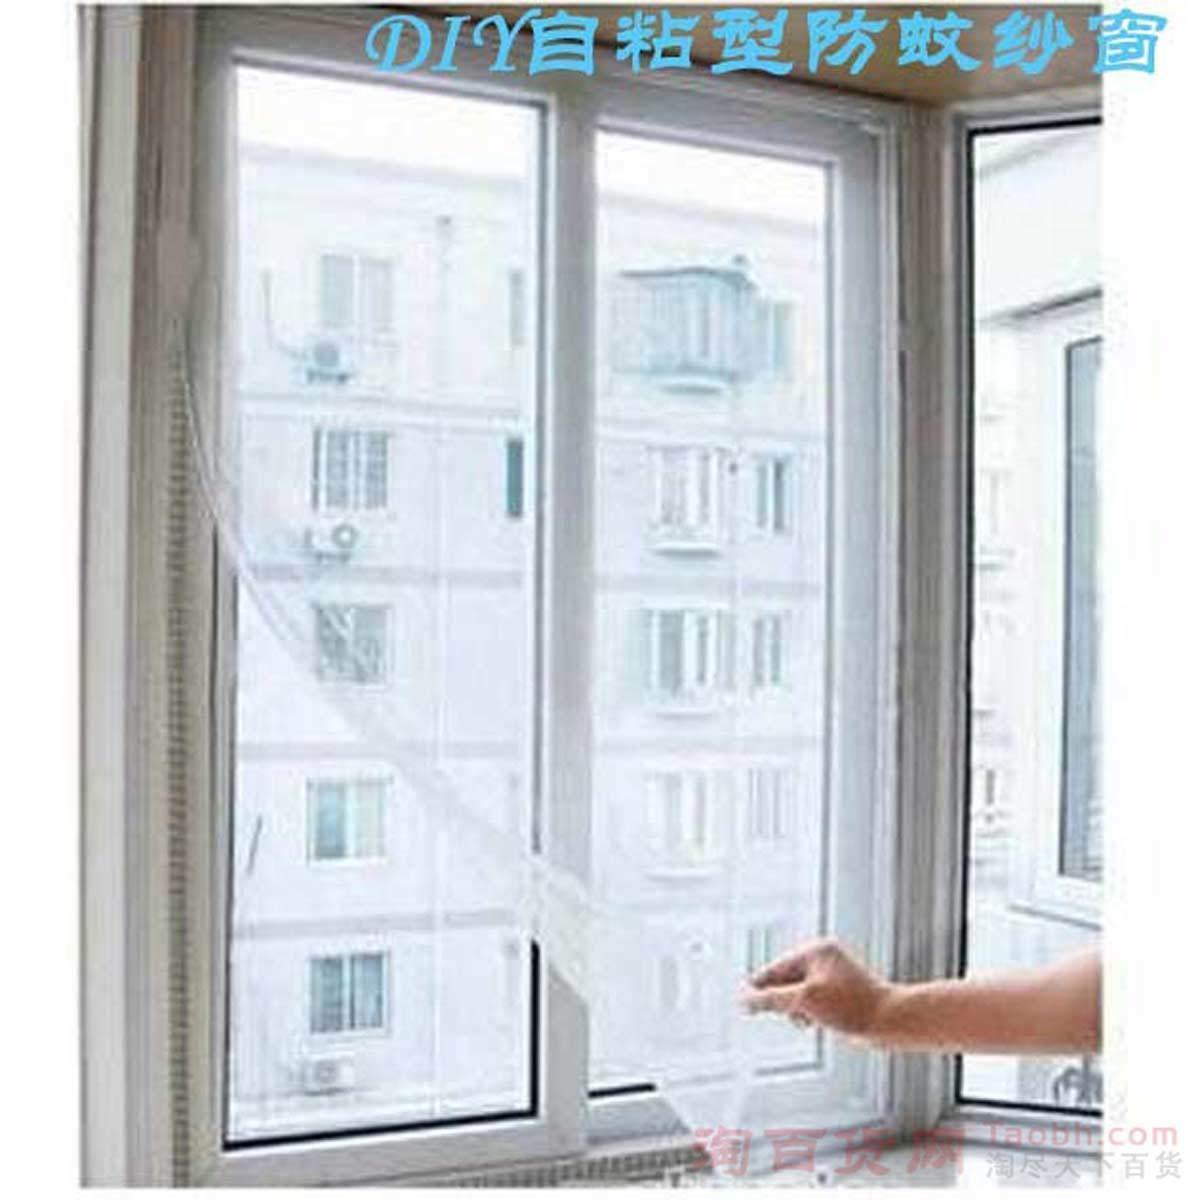 pemasangan tirai pintu magnetik isi satu set tirai tirai jendela